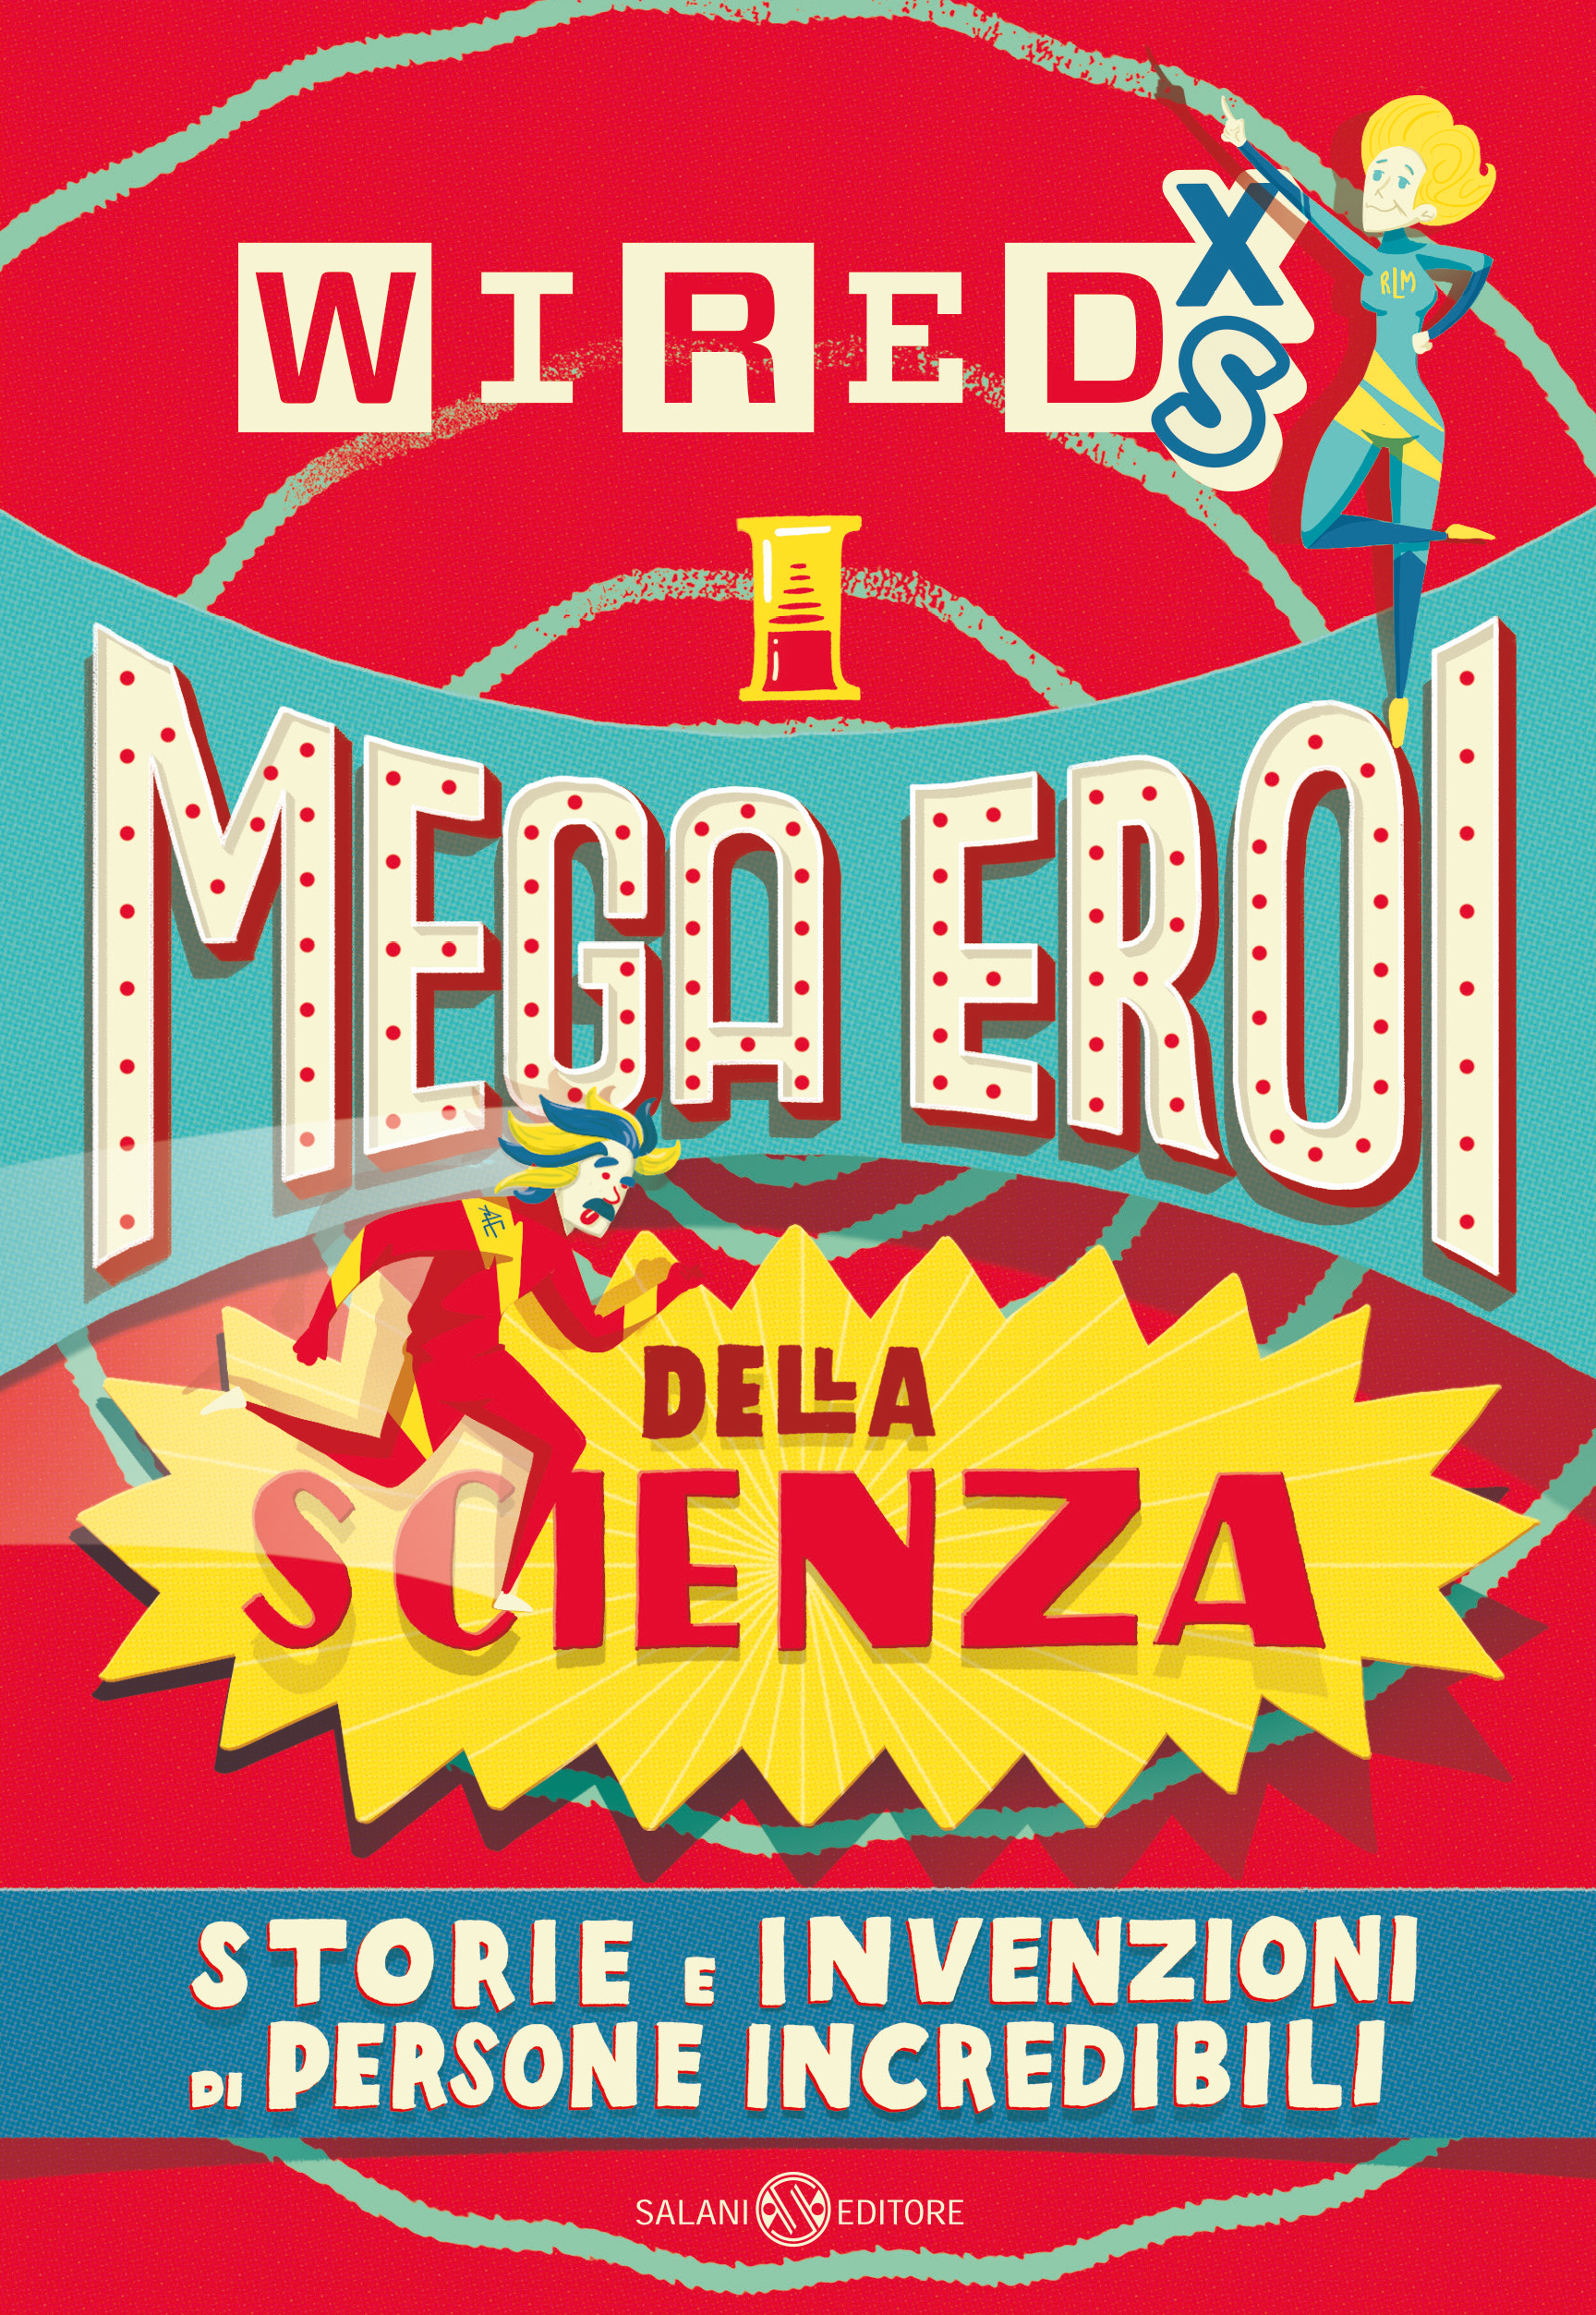 Unite Genova Calendario.Conde Nast Italia News